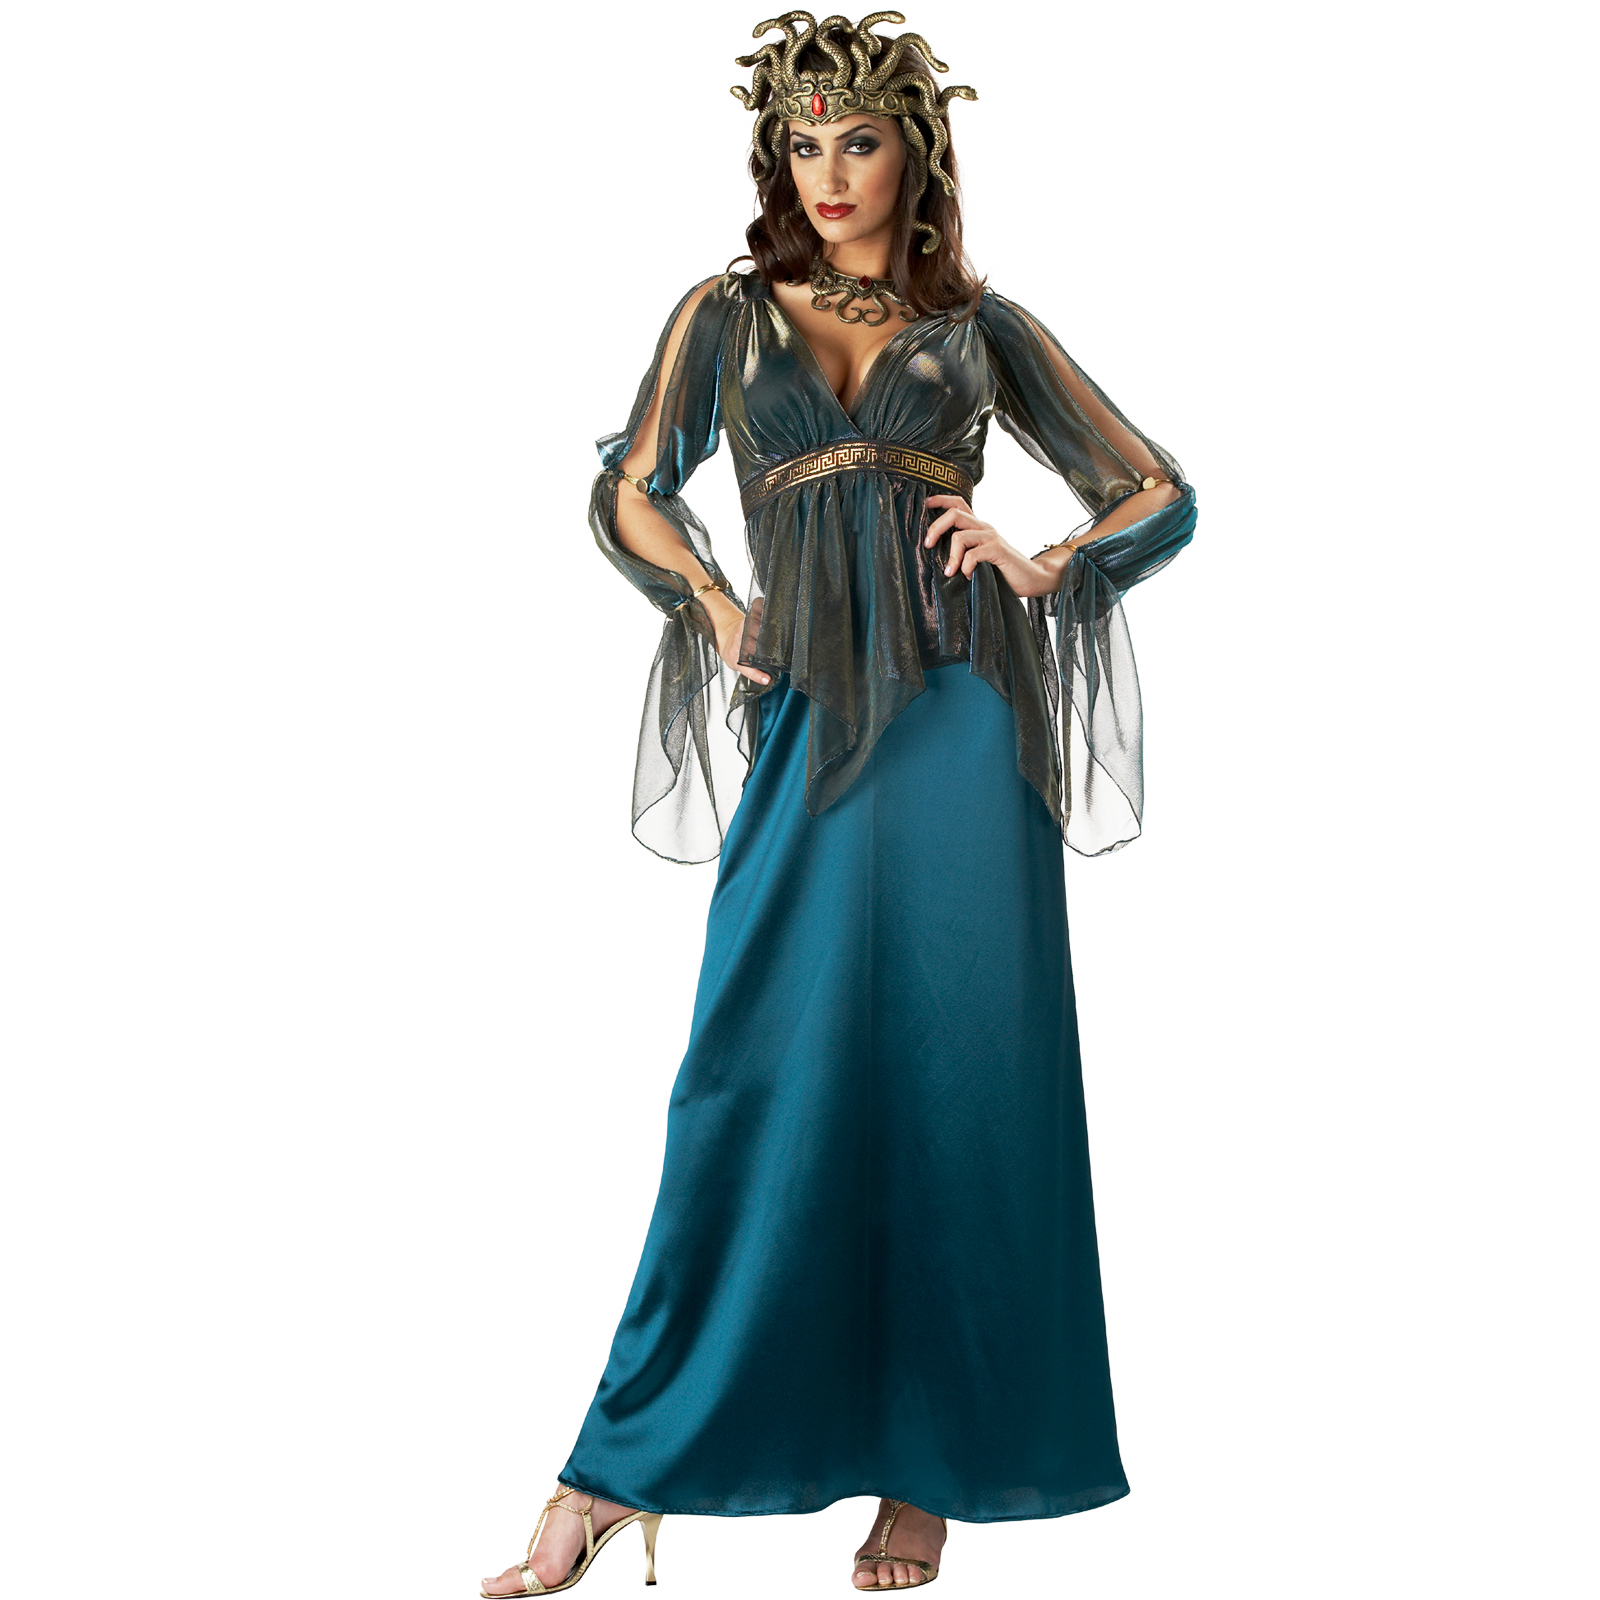 MEDUSA Womens Costume Greek Myth Goddess Grecian 12-14 DISGUISE